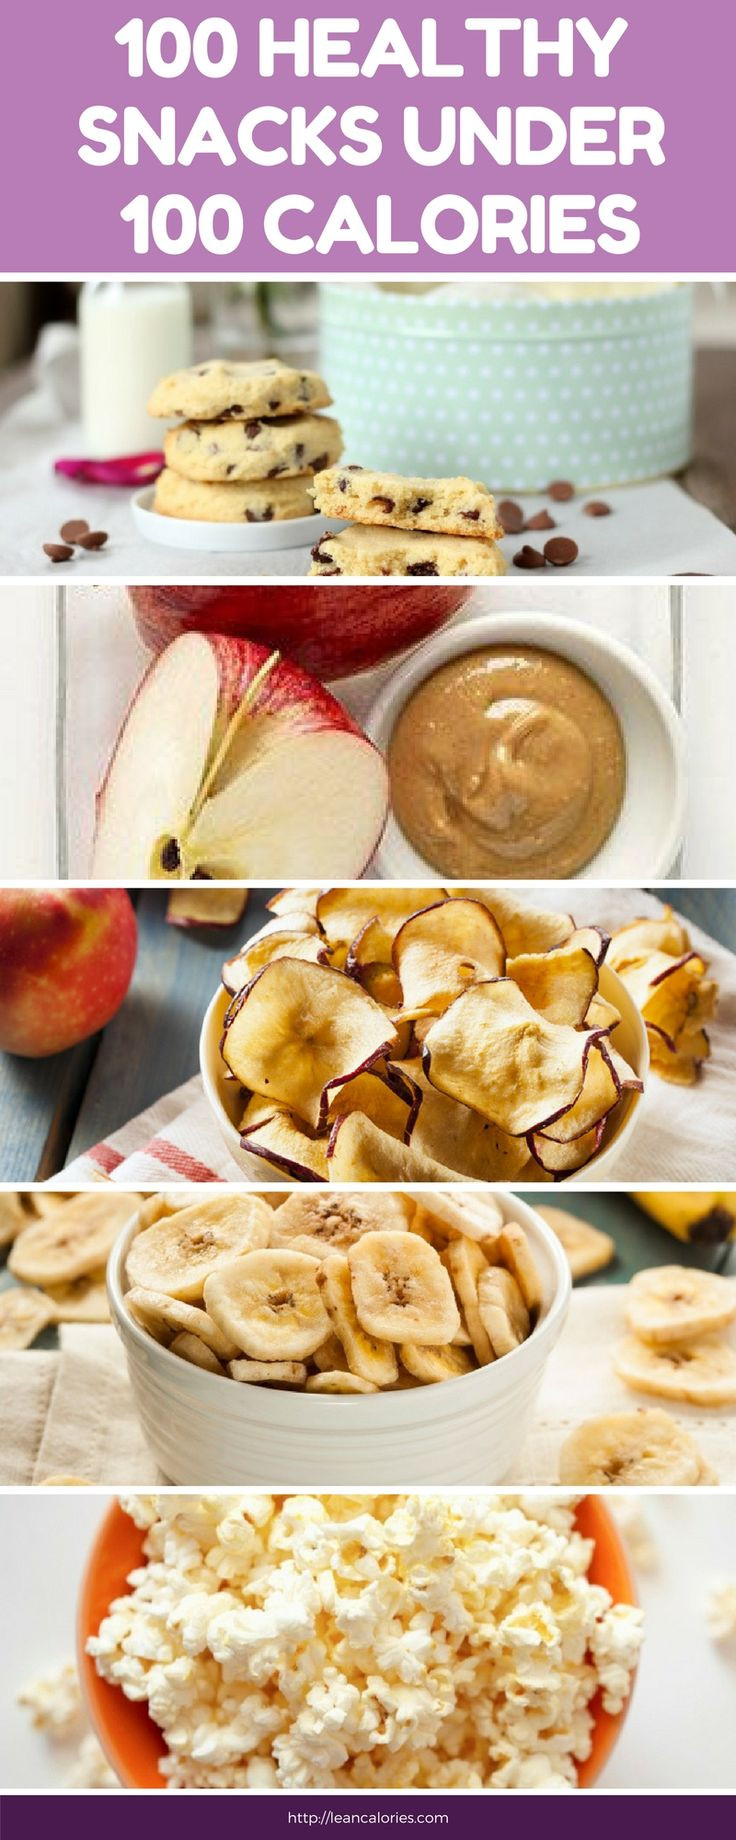 Healthy Snacks Between Meals  De 25 bedste idéer inden for 100 calories på Pinterest